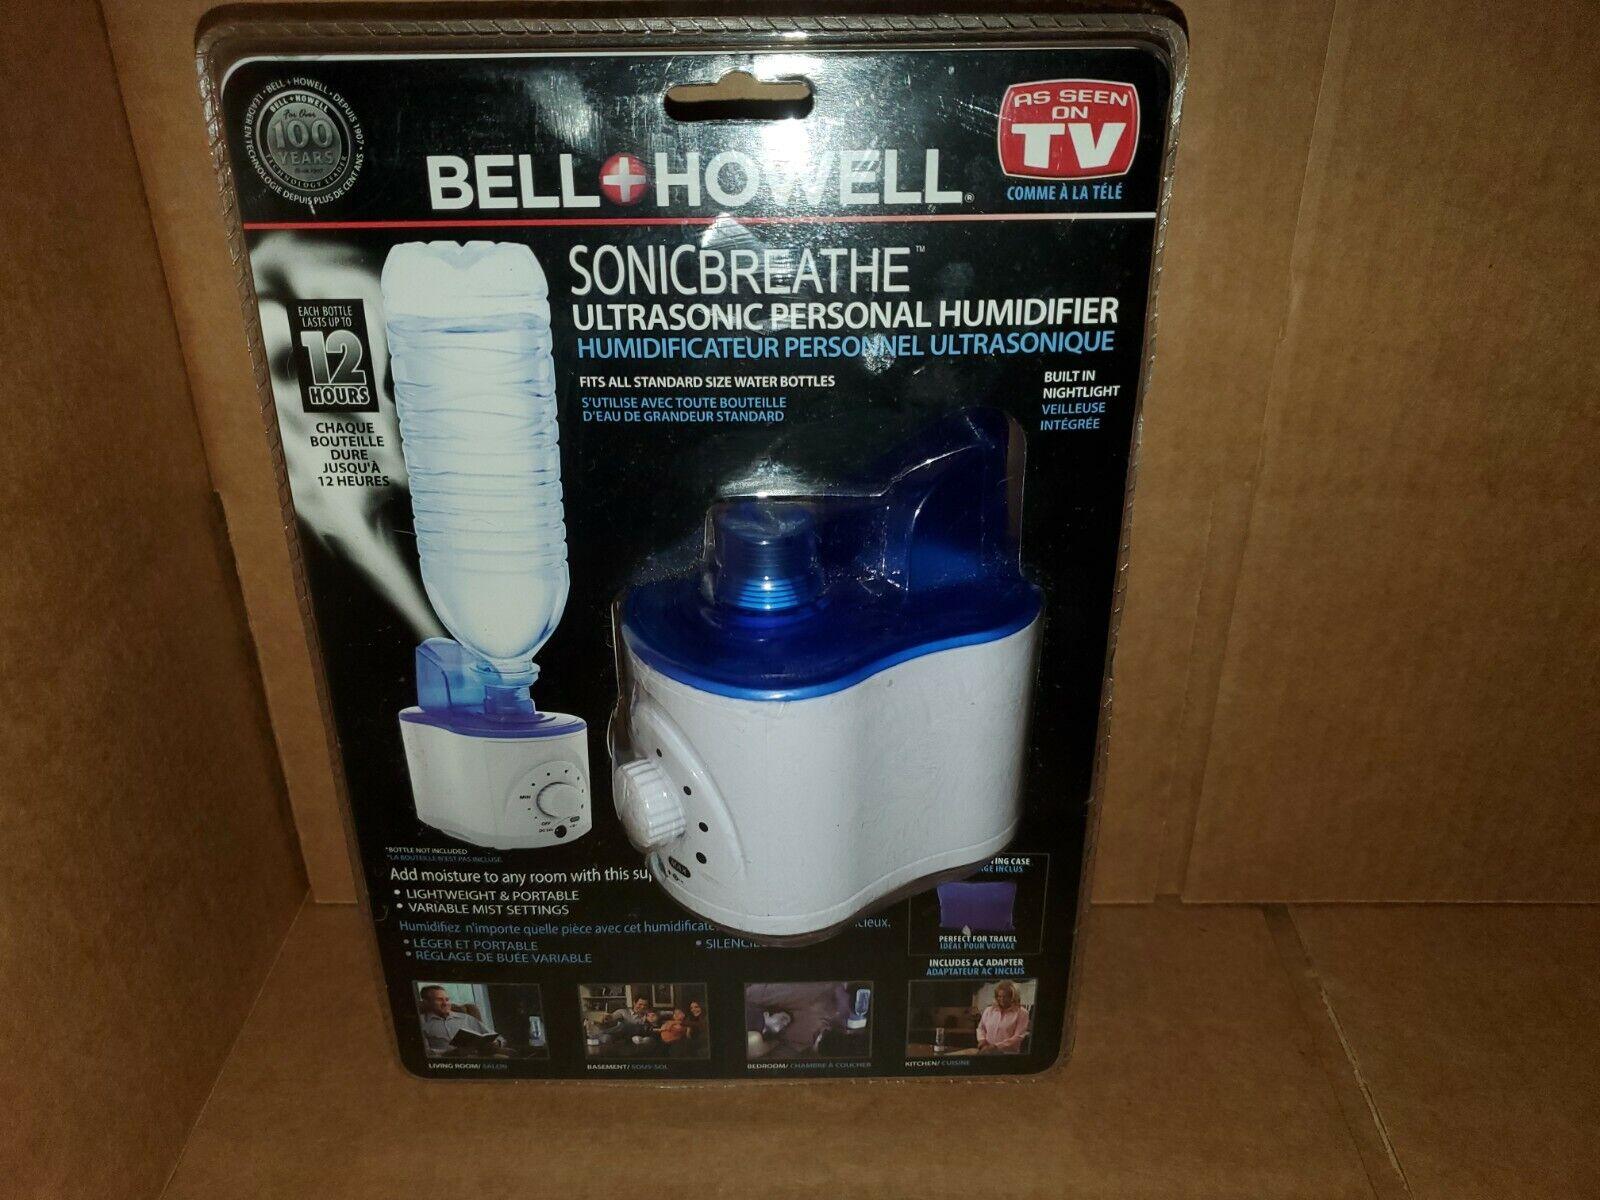 BELL + HOWELL SONIC BREATHE Ultrasonic Personal Humidifier NEW SEALED NIB